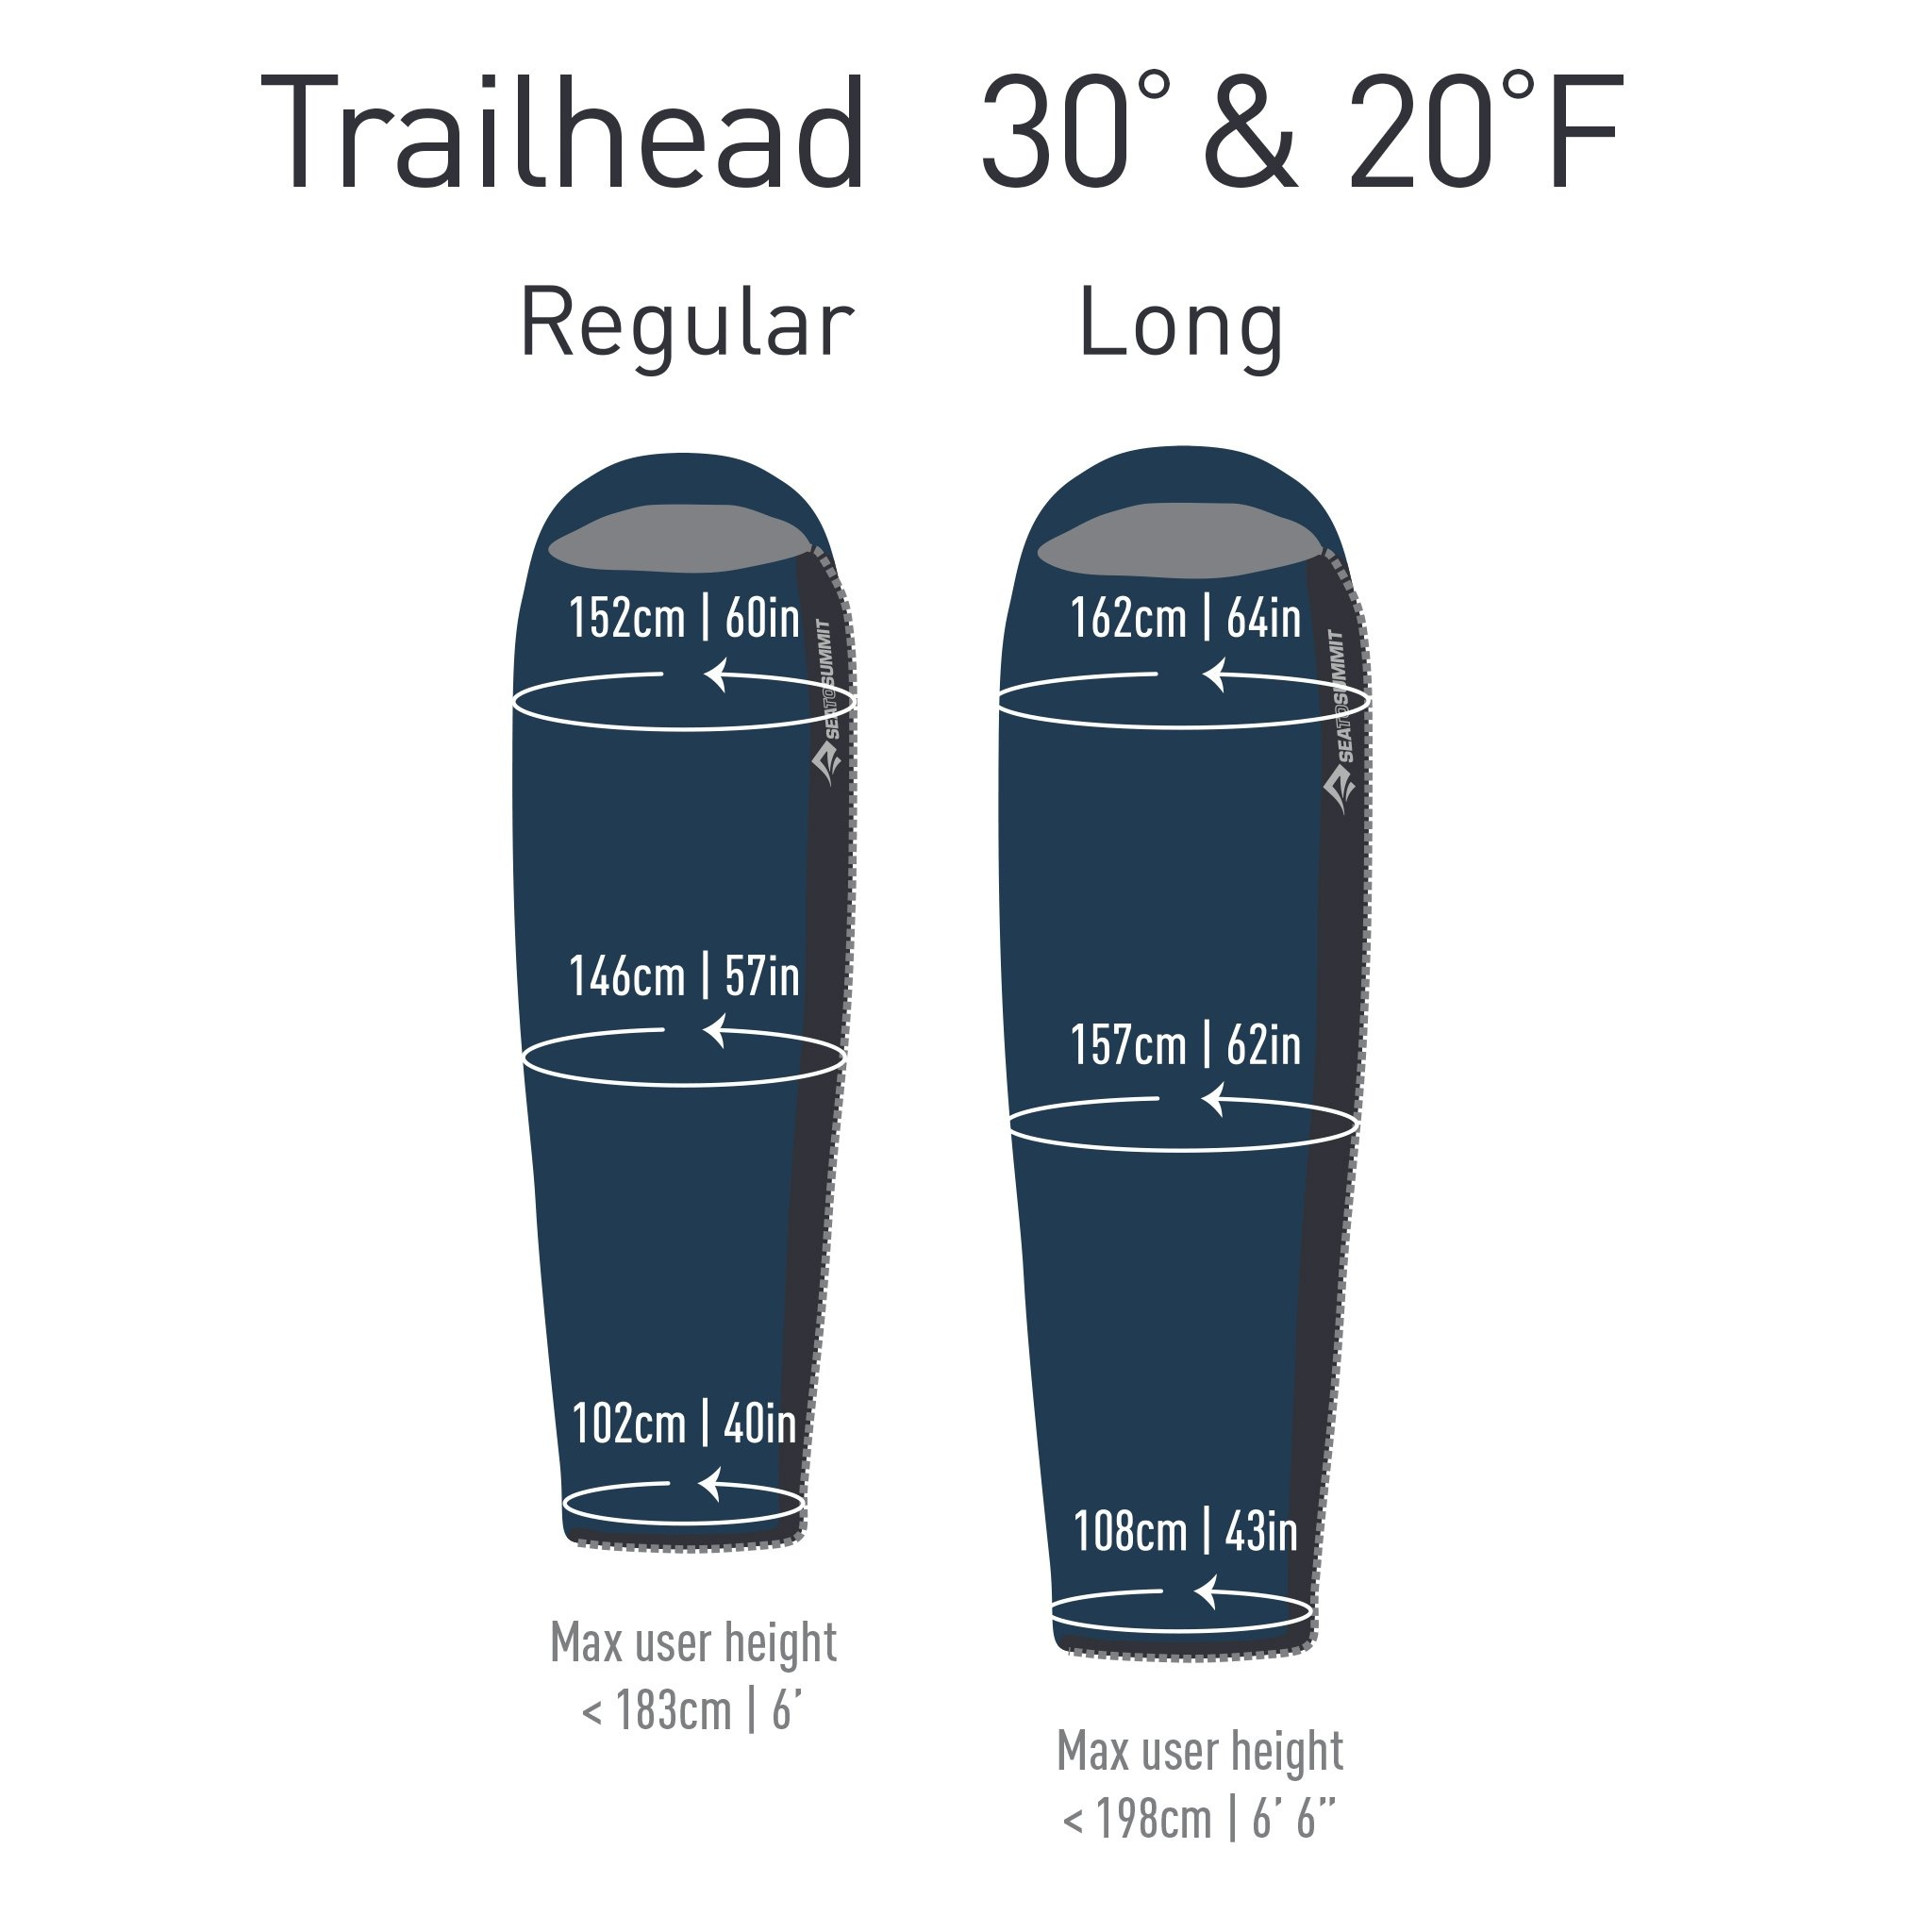 Trailhead Synthetic Sleeping Bag, 30F, Long-6